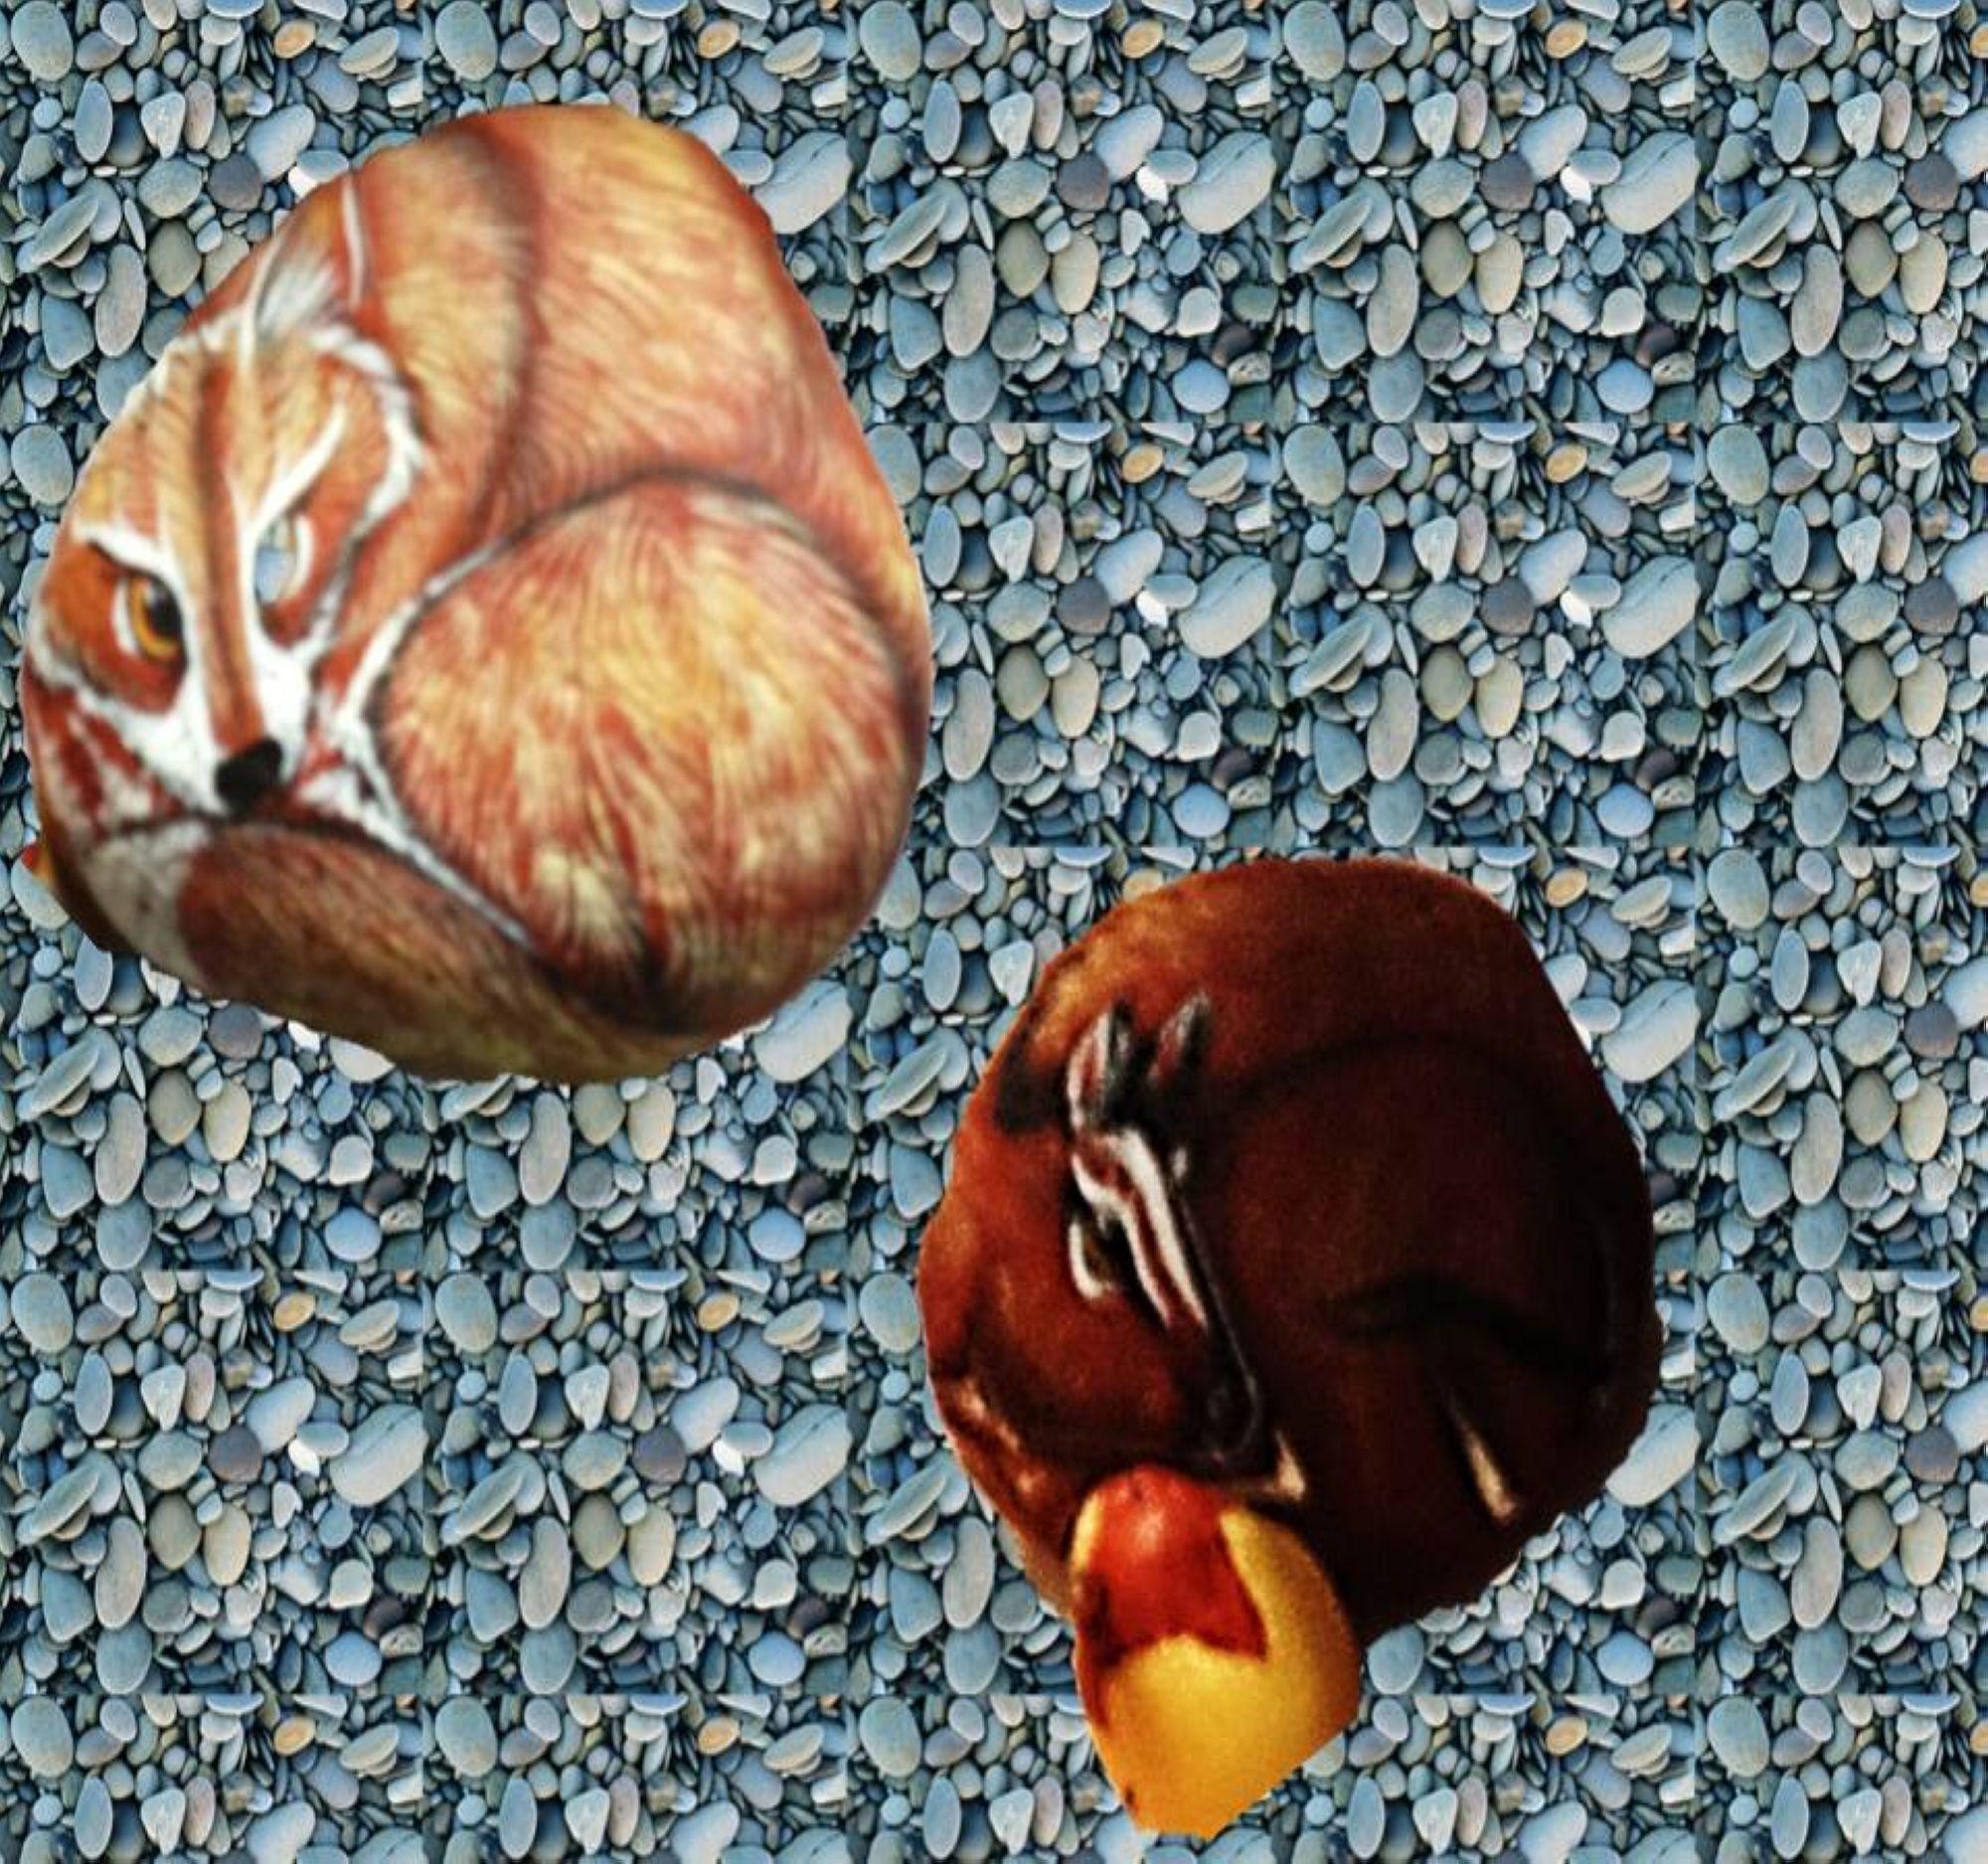 piedras pintadas con animales